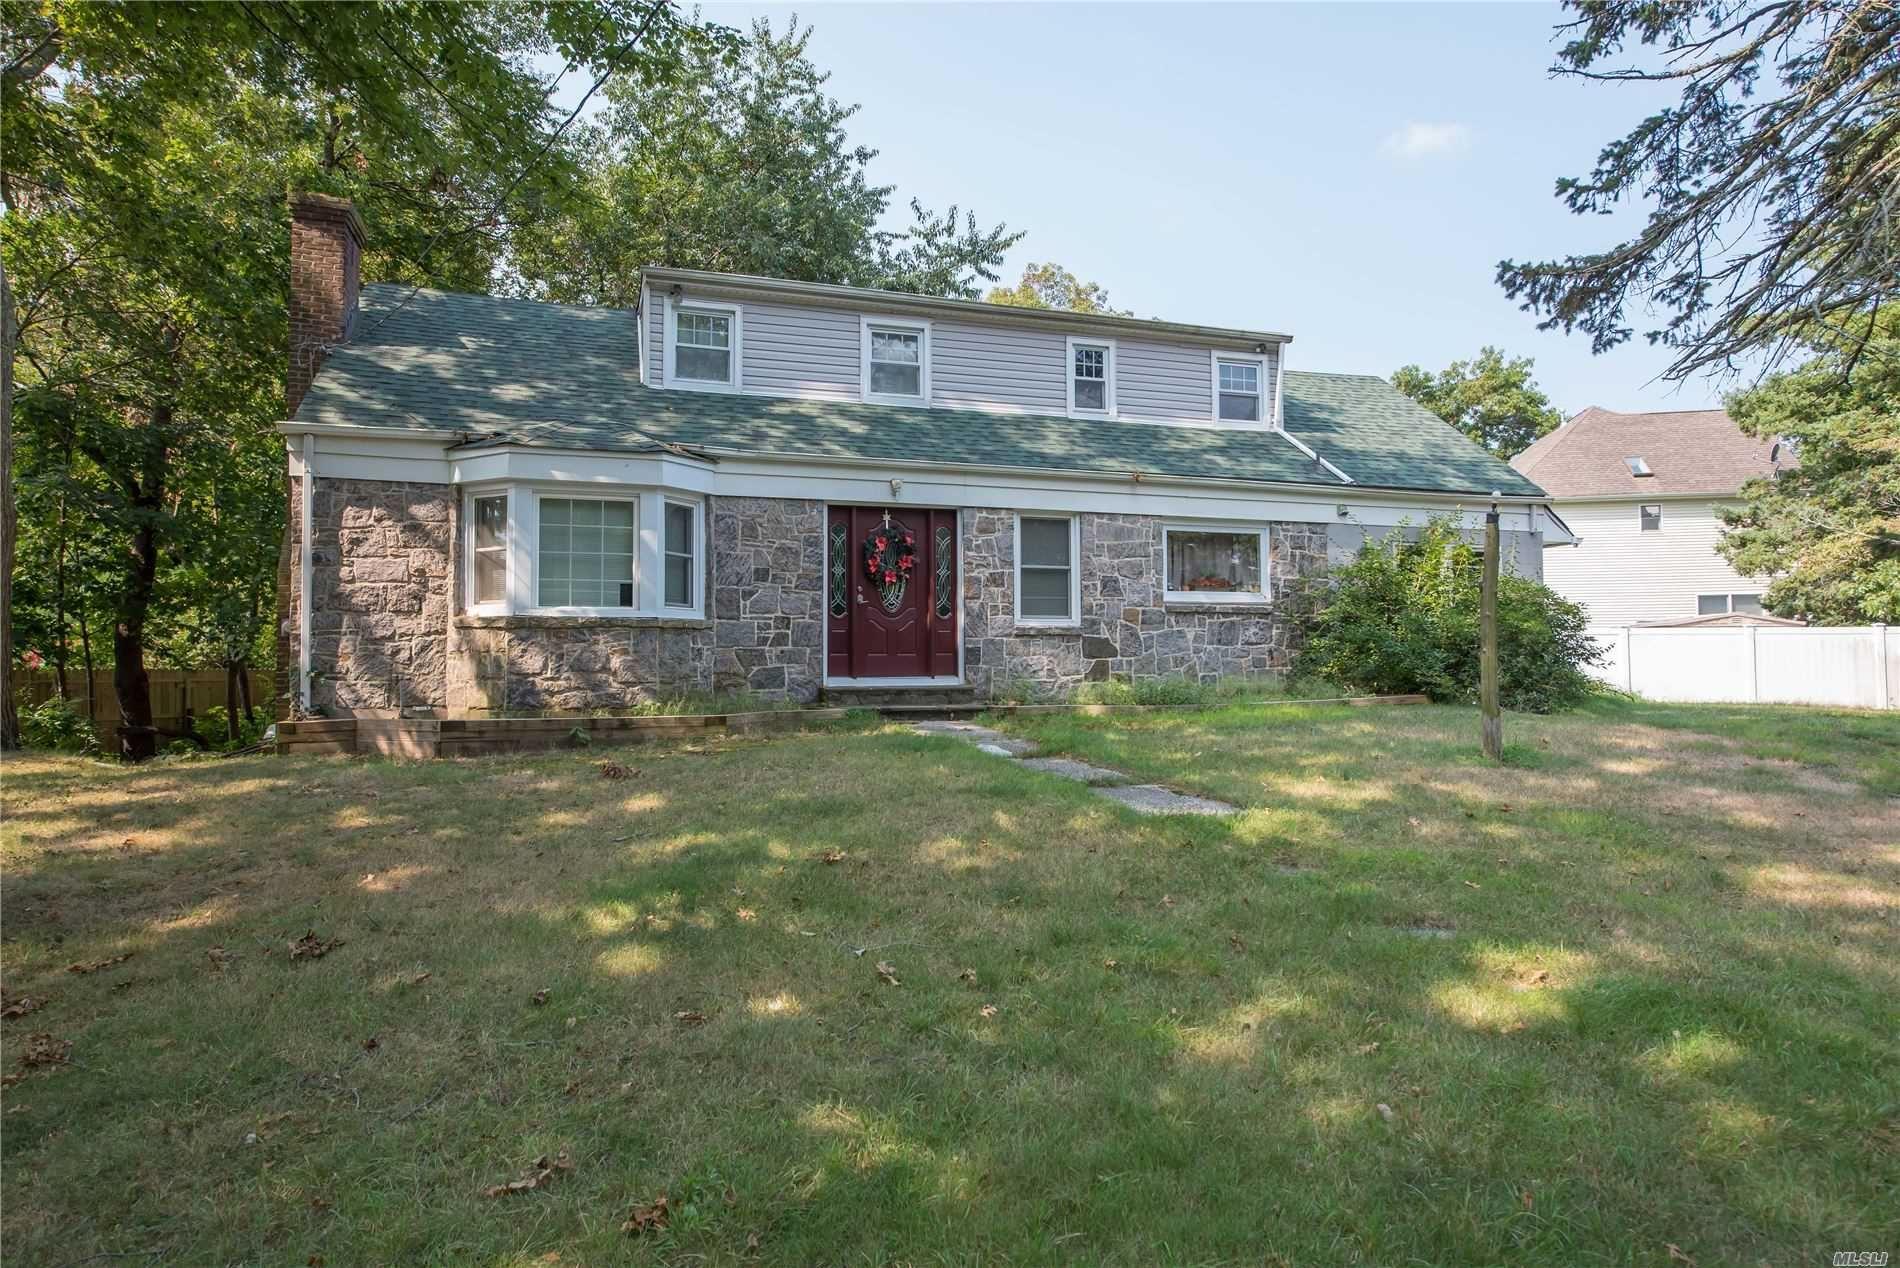 9 Clearfield Place, Huntington, NY 11743 - MLS#: 3246985